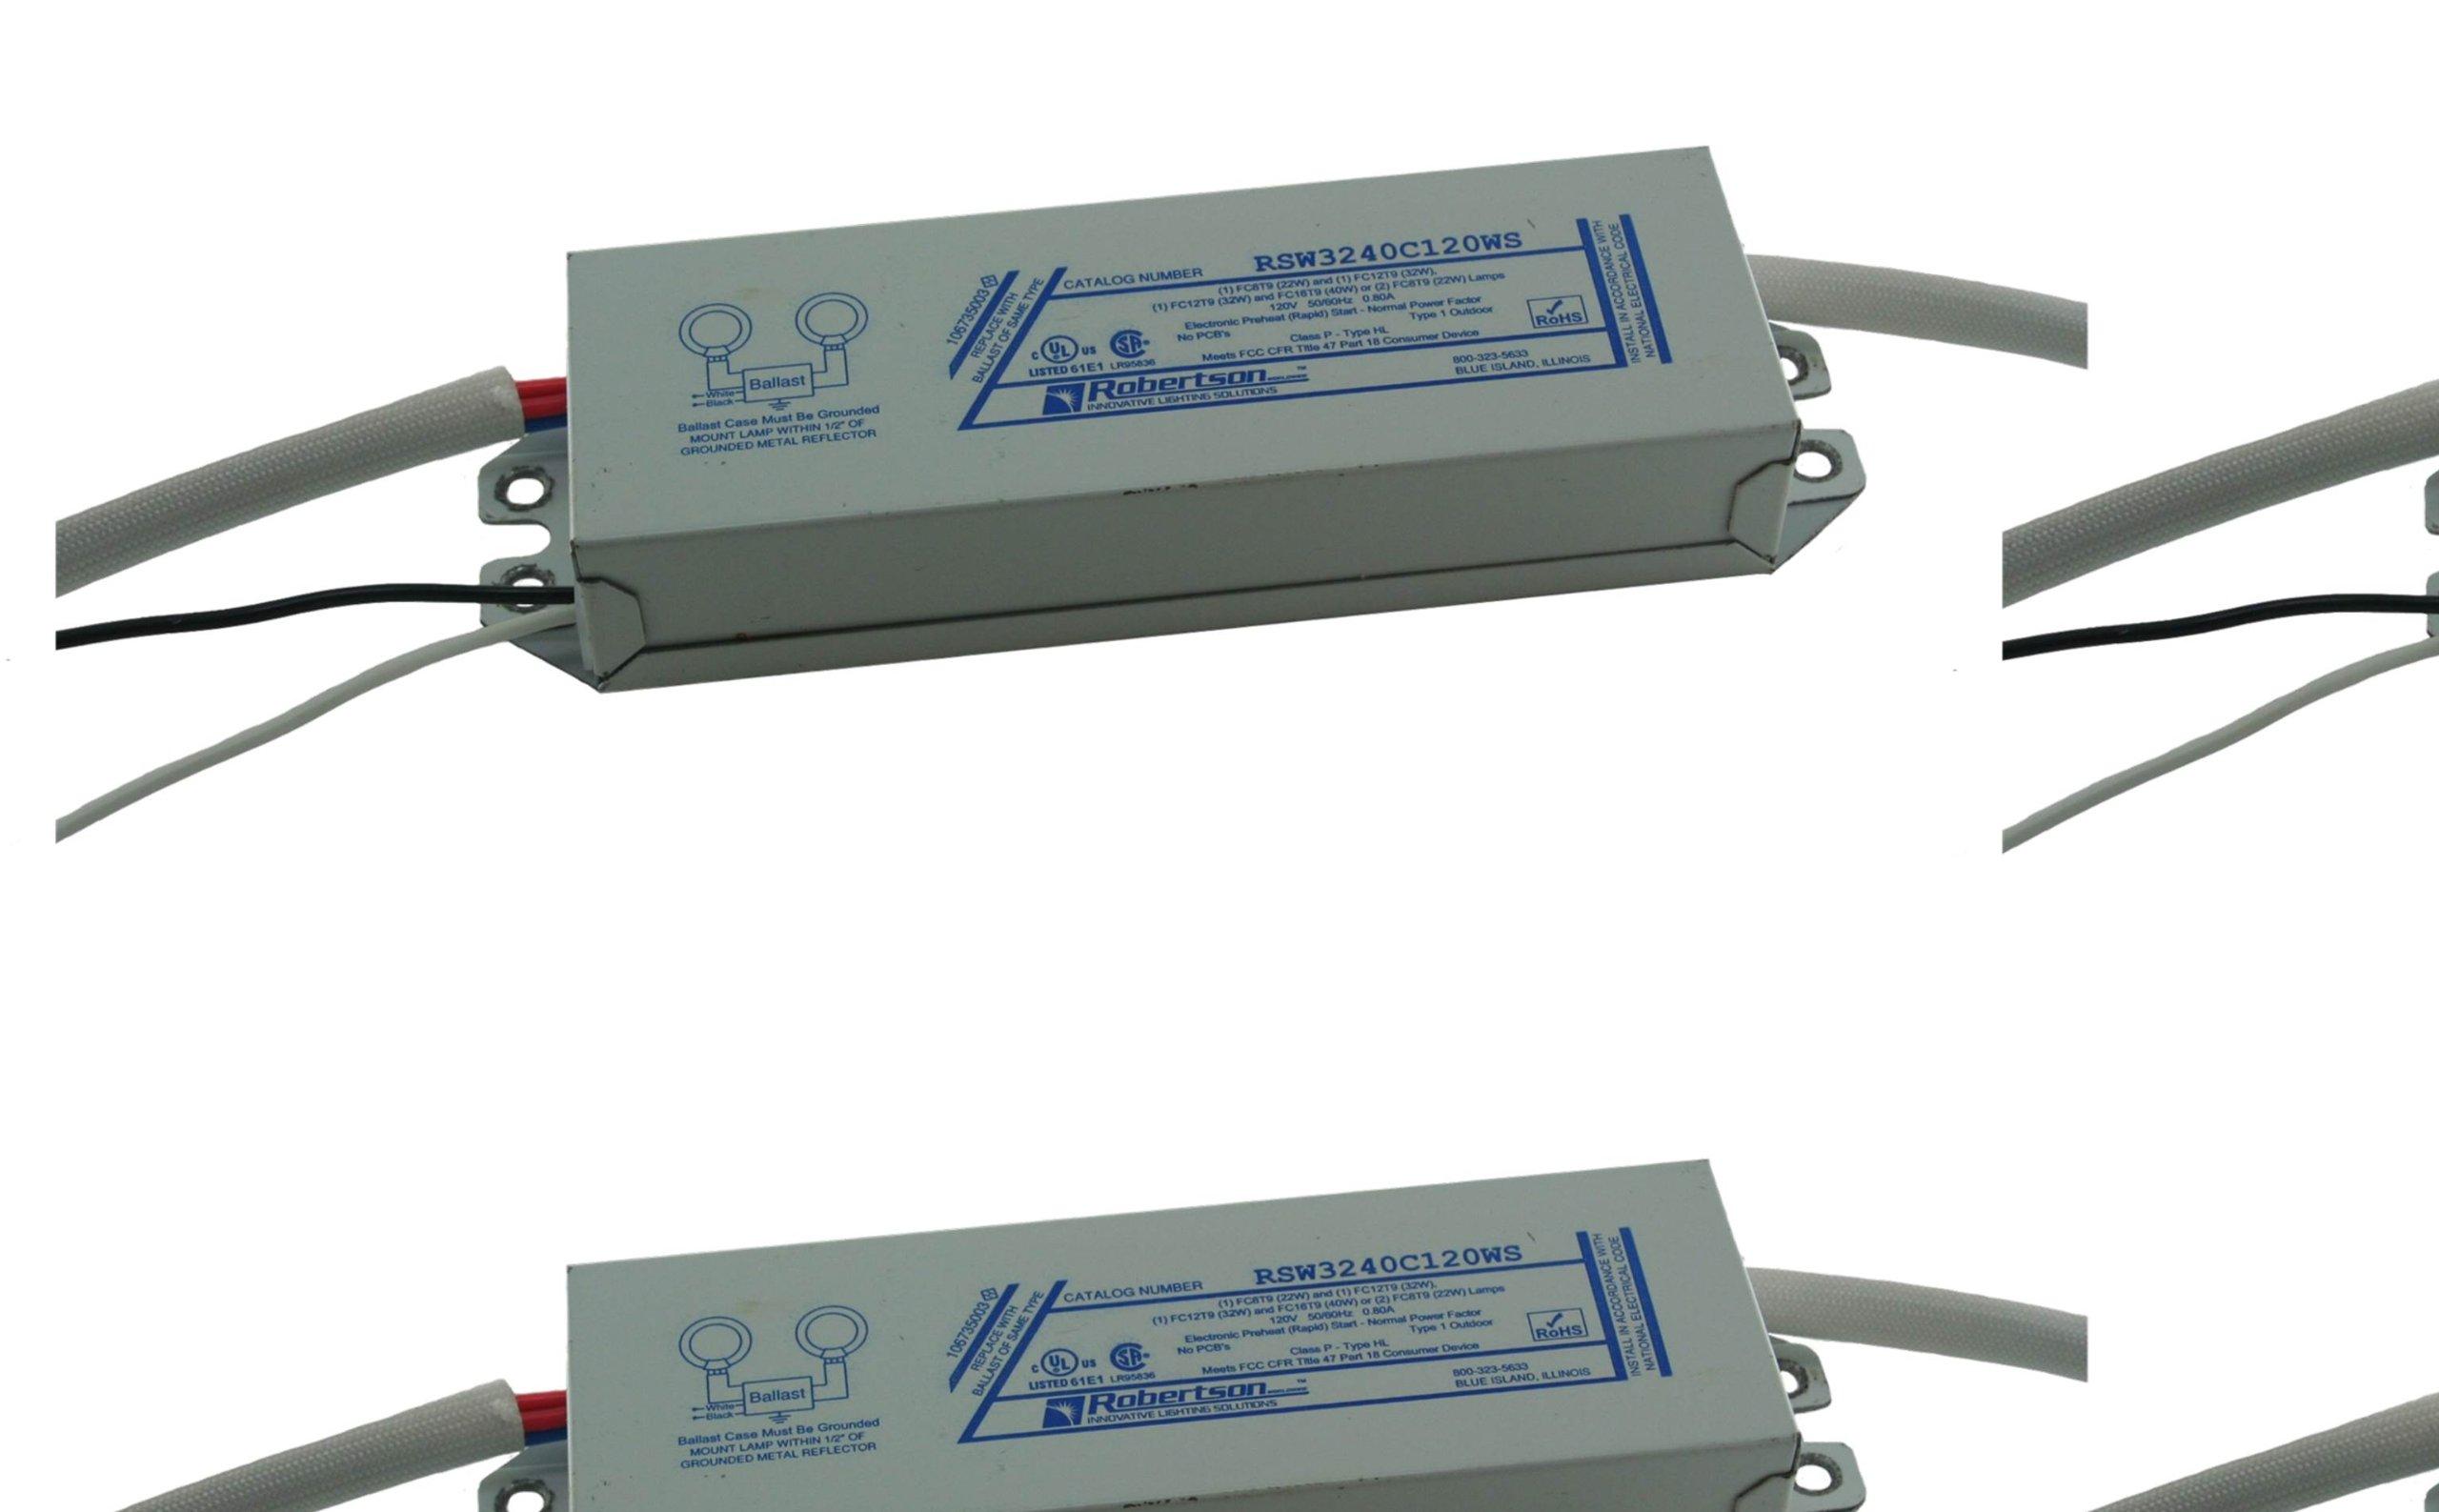 ROBERTSON 1P20134 OEM-Pak of 20 Fluorescent eBallast, 2 FC8T9 Circline Lamp Preheat-Rapid Start, 120Vac, 50-60Hz, Normal Ballast Factor, NPF, Model RSW3240C120WS AA (Replaces Model RSW3240C120WS /A)